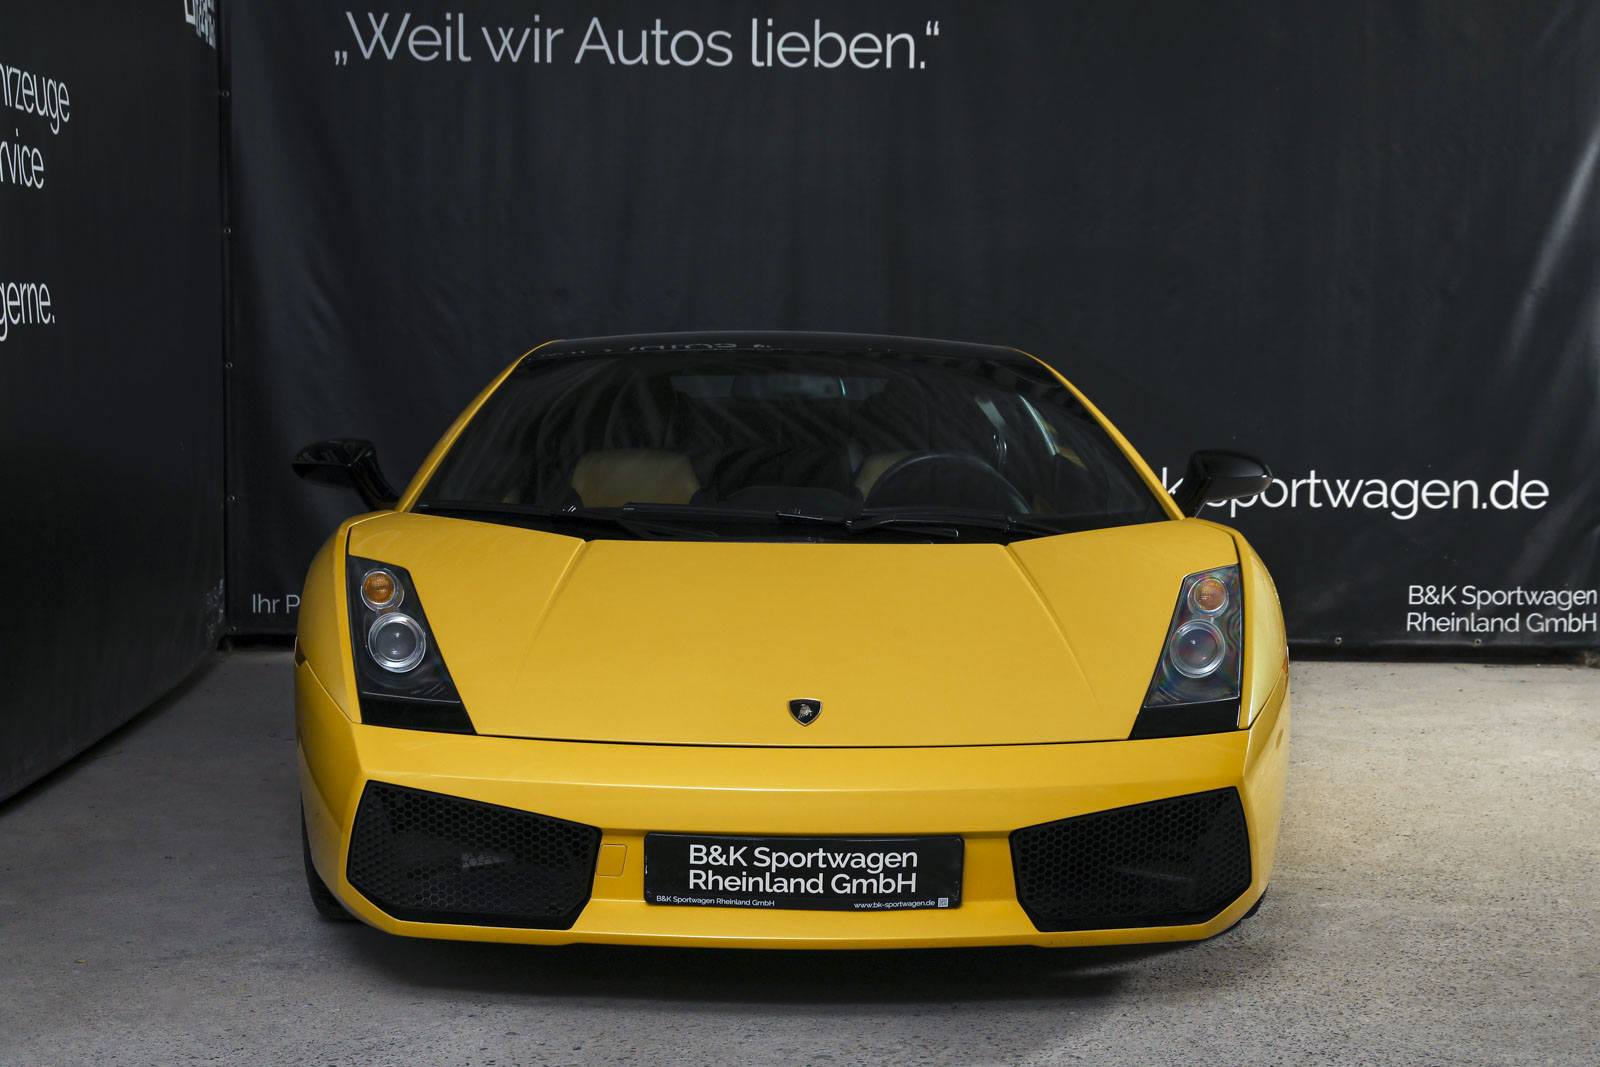 lamborghini_gallardo_gelb_schwarz_lam-5076_23